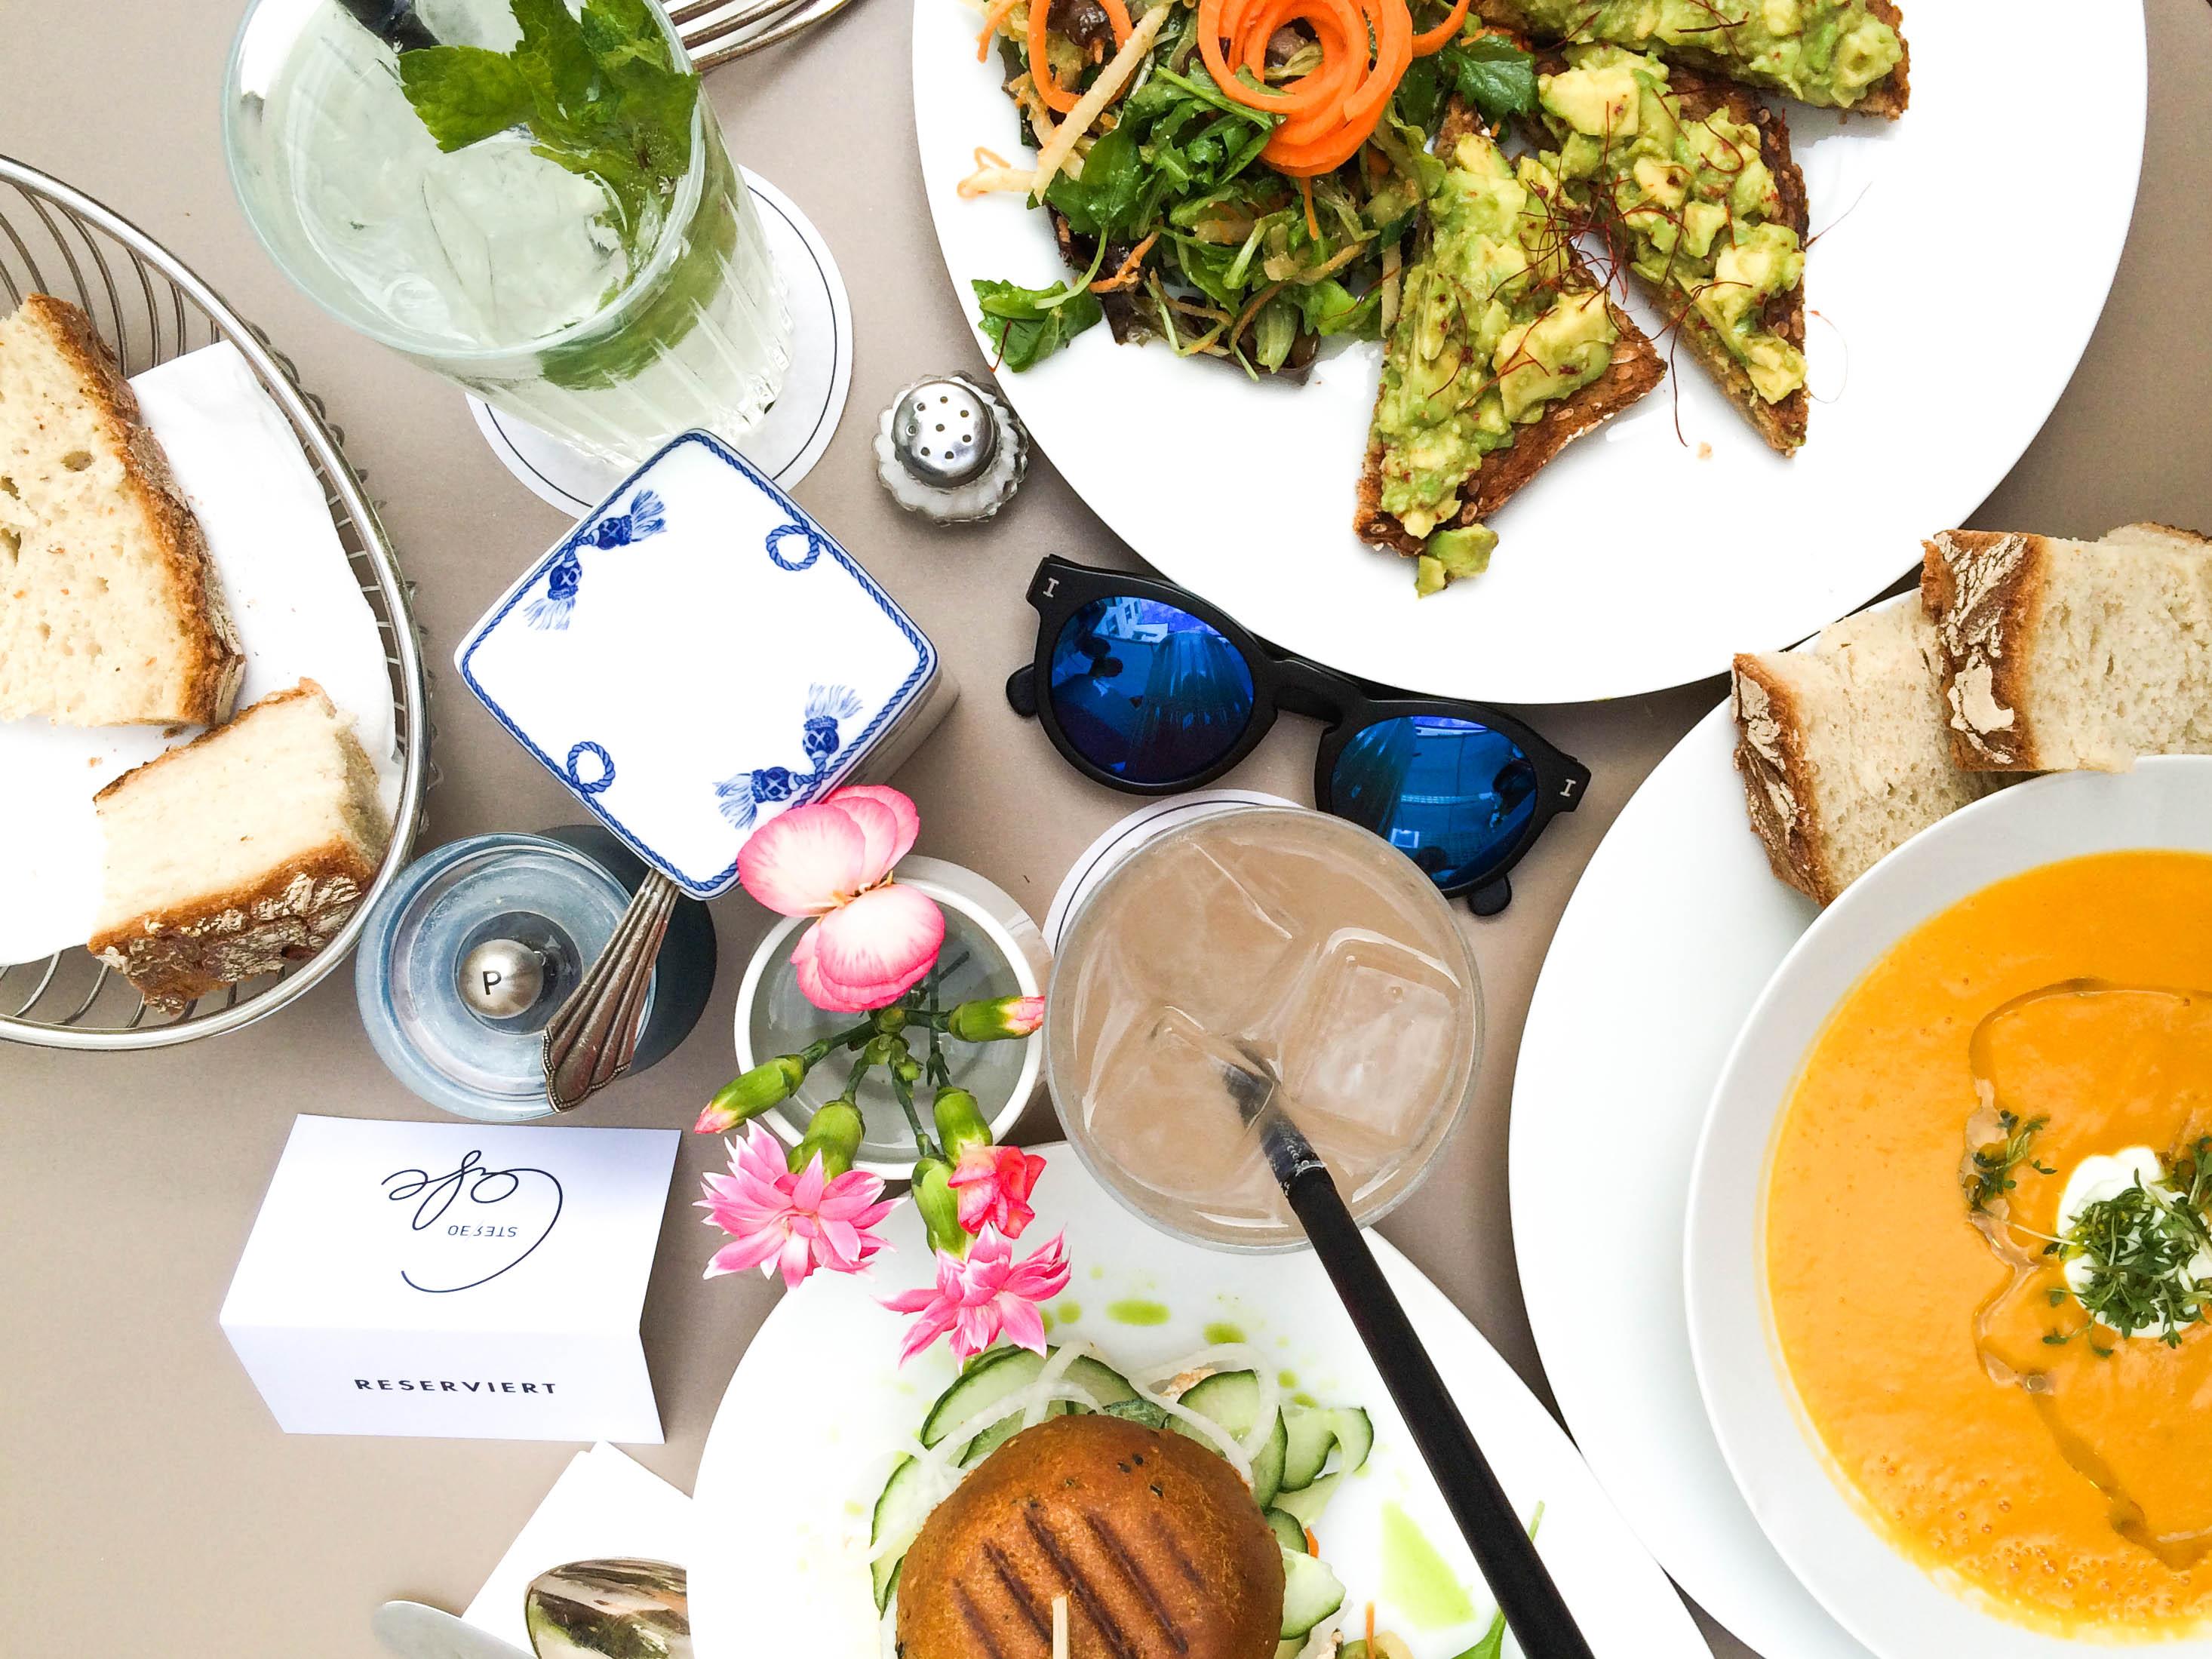 Stereo-Café-Munich-Hotspot-Lindarella-Vegan-Clean-Healthy-Foodblogger-München-Deutschland-Fitnessblog-3